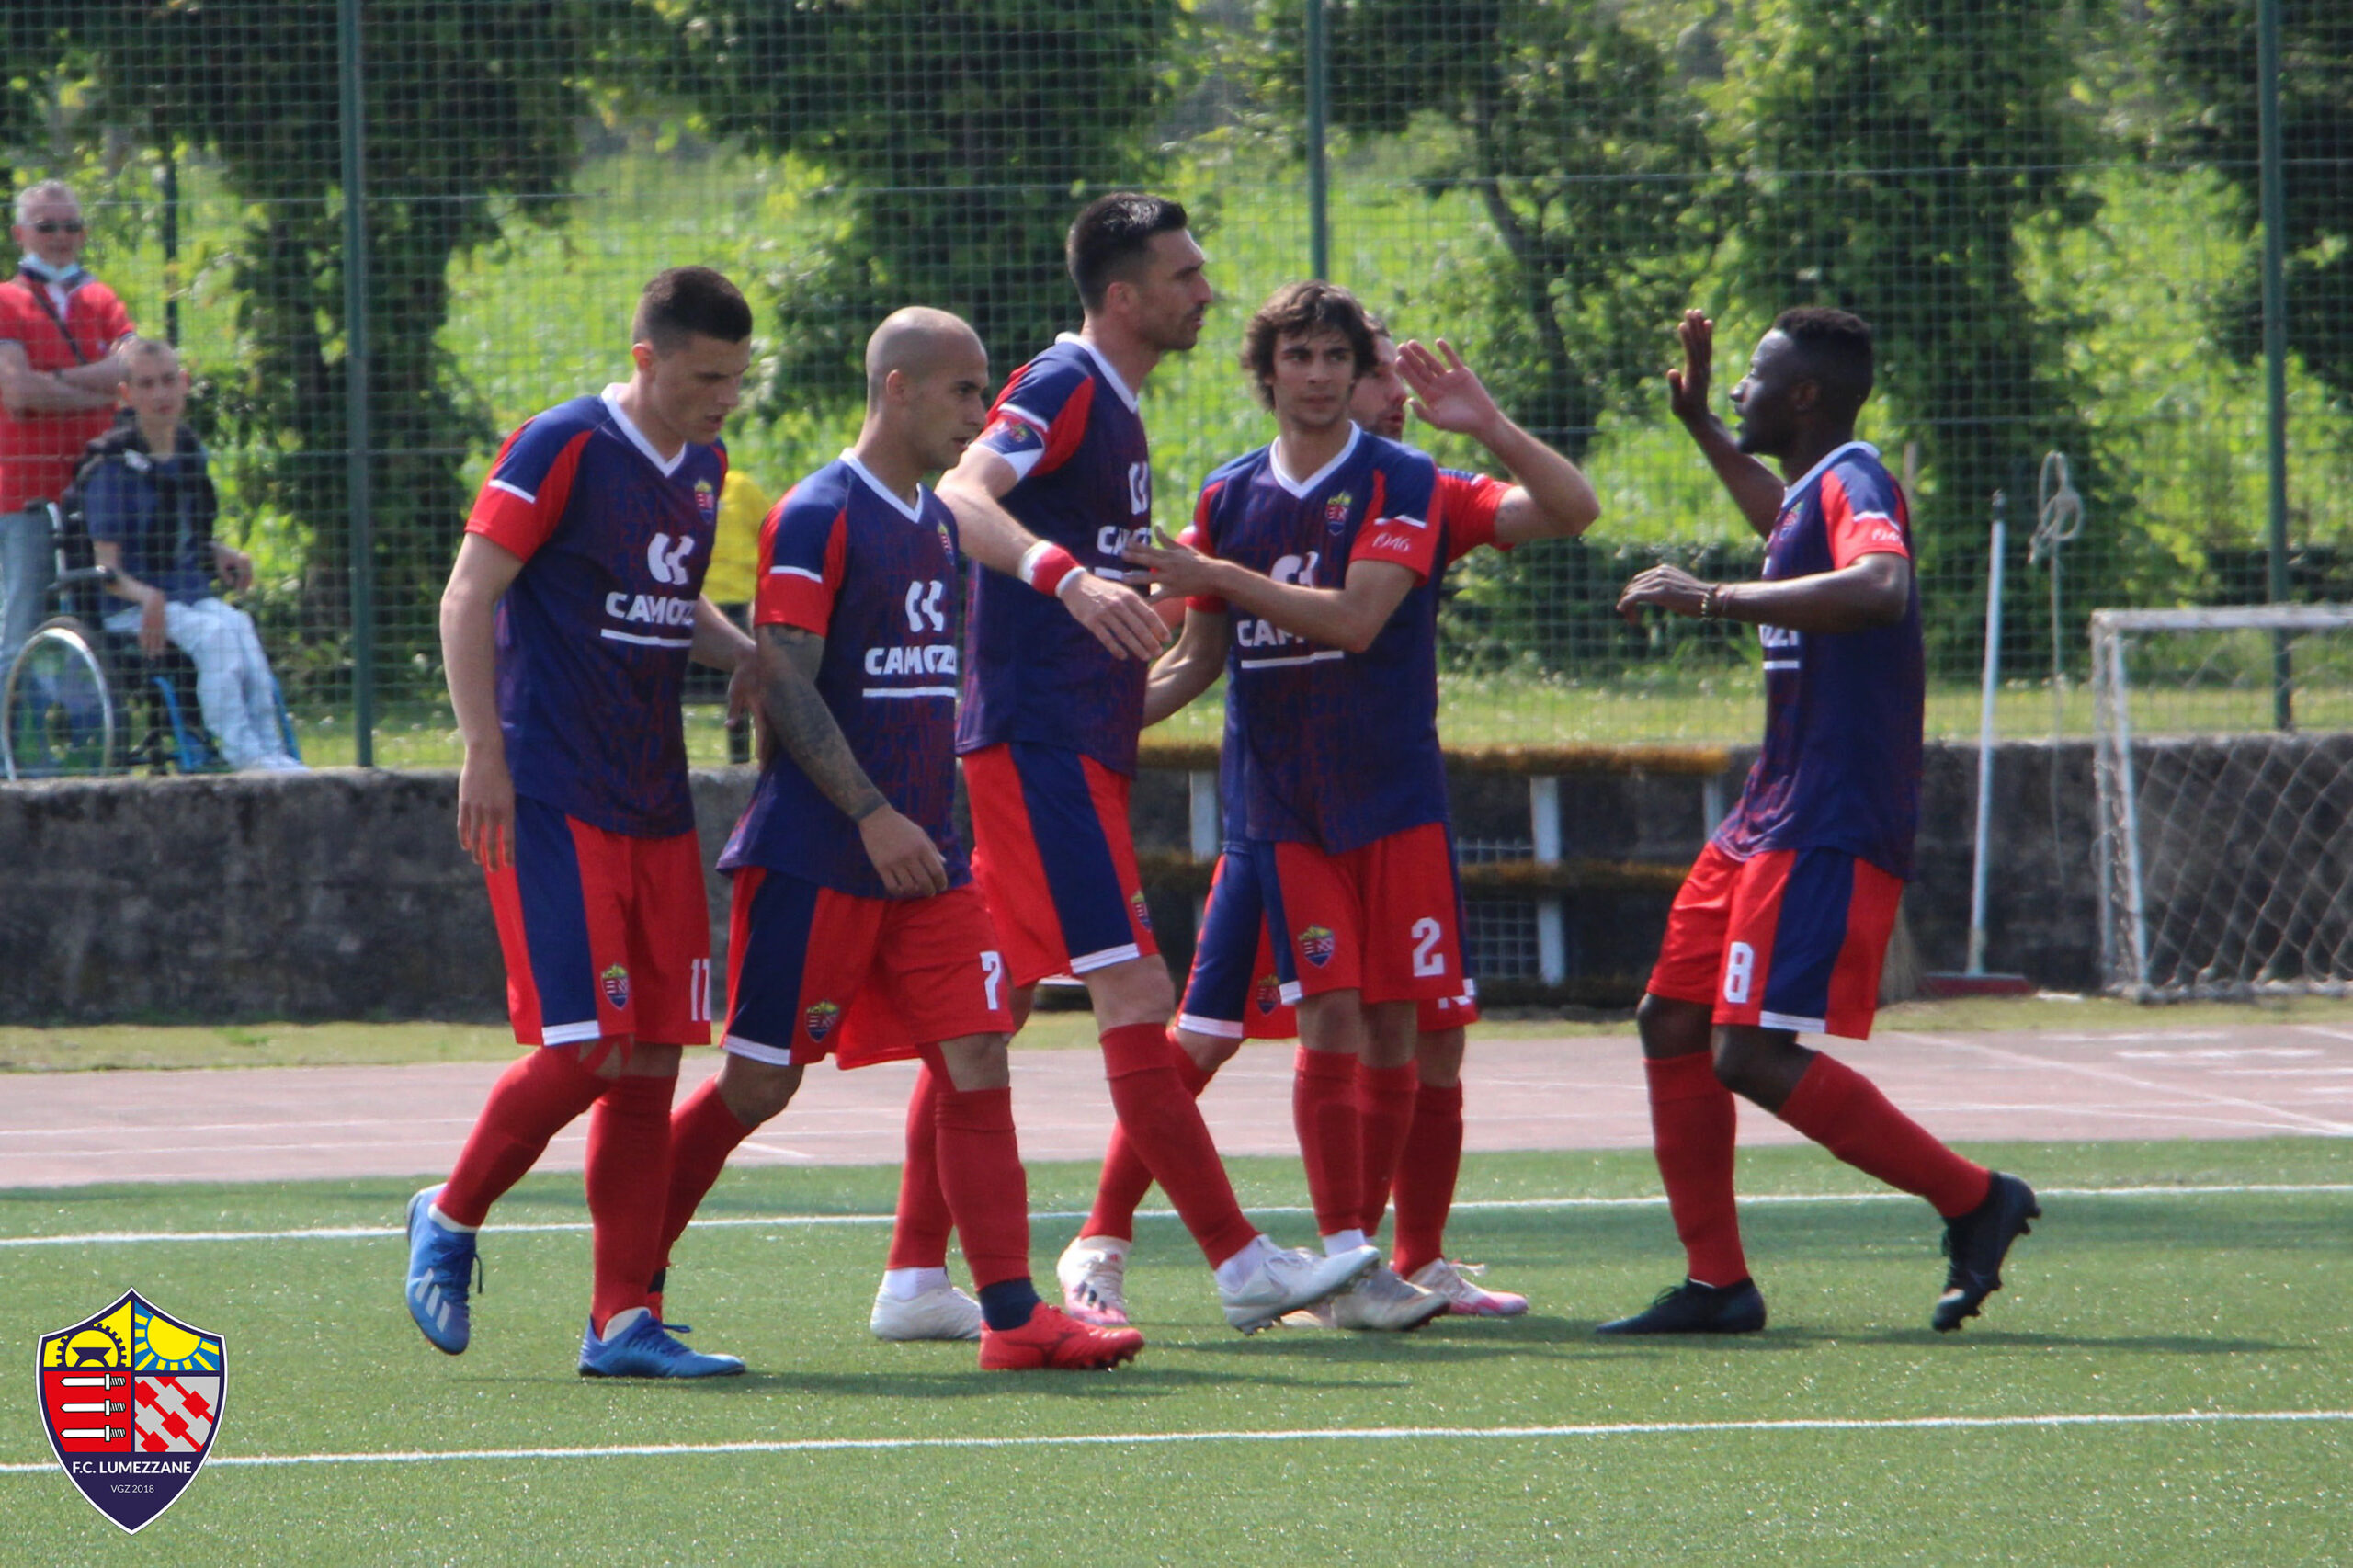 Campionato | 9ª Giornata | Lemine Almenno – FC LUMEZZANE VGZ 1-2